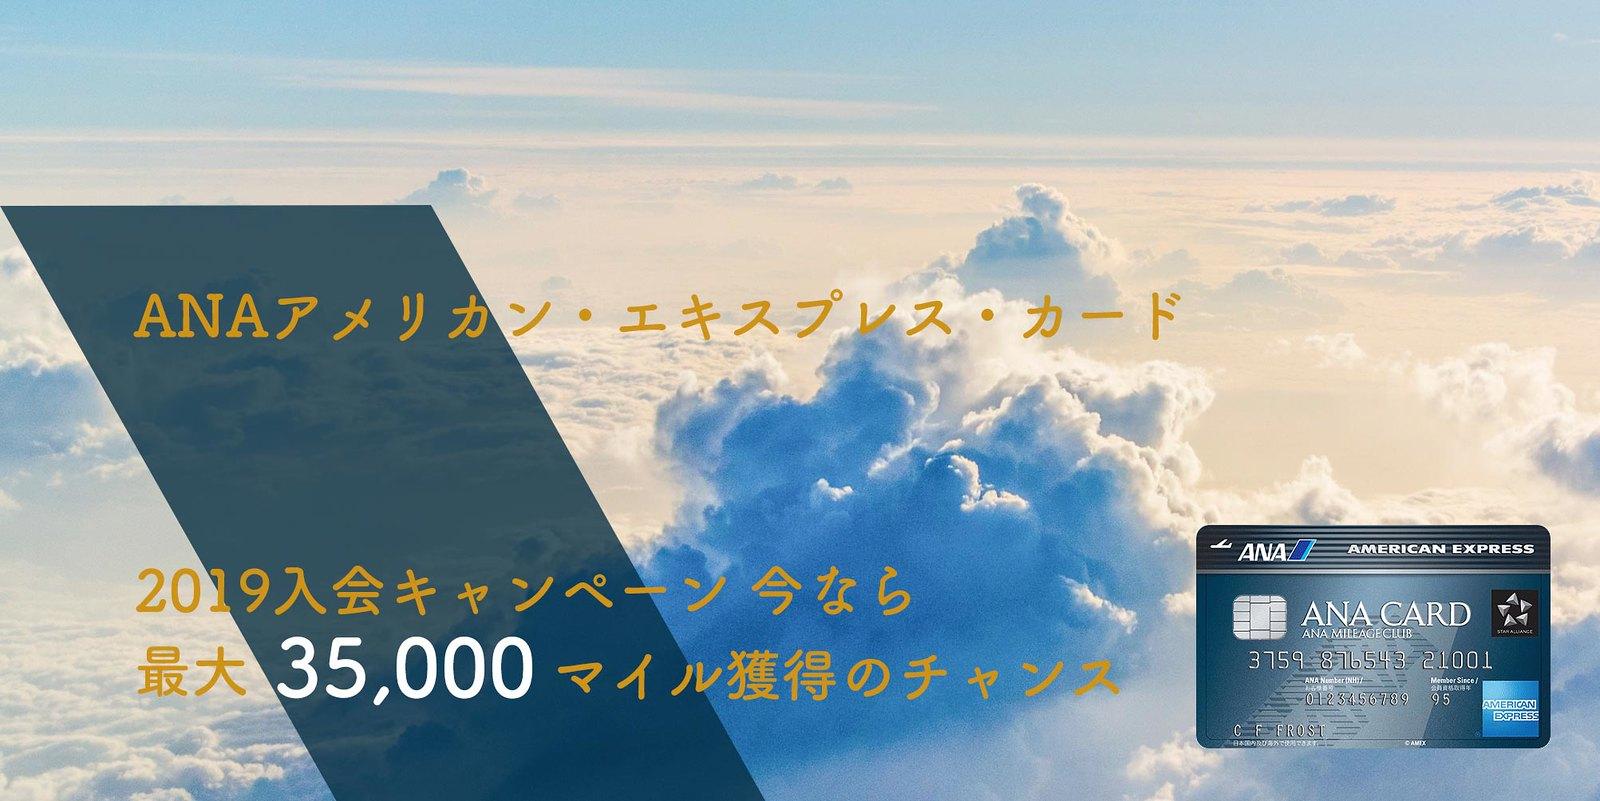 ANAアメックス入会キャンペーン 2019年 最大35000マイル